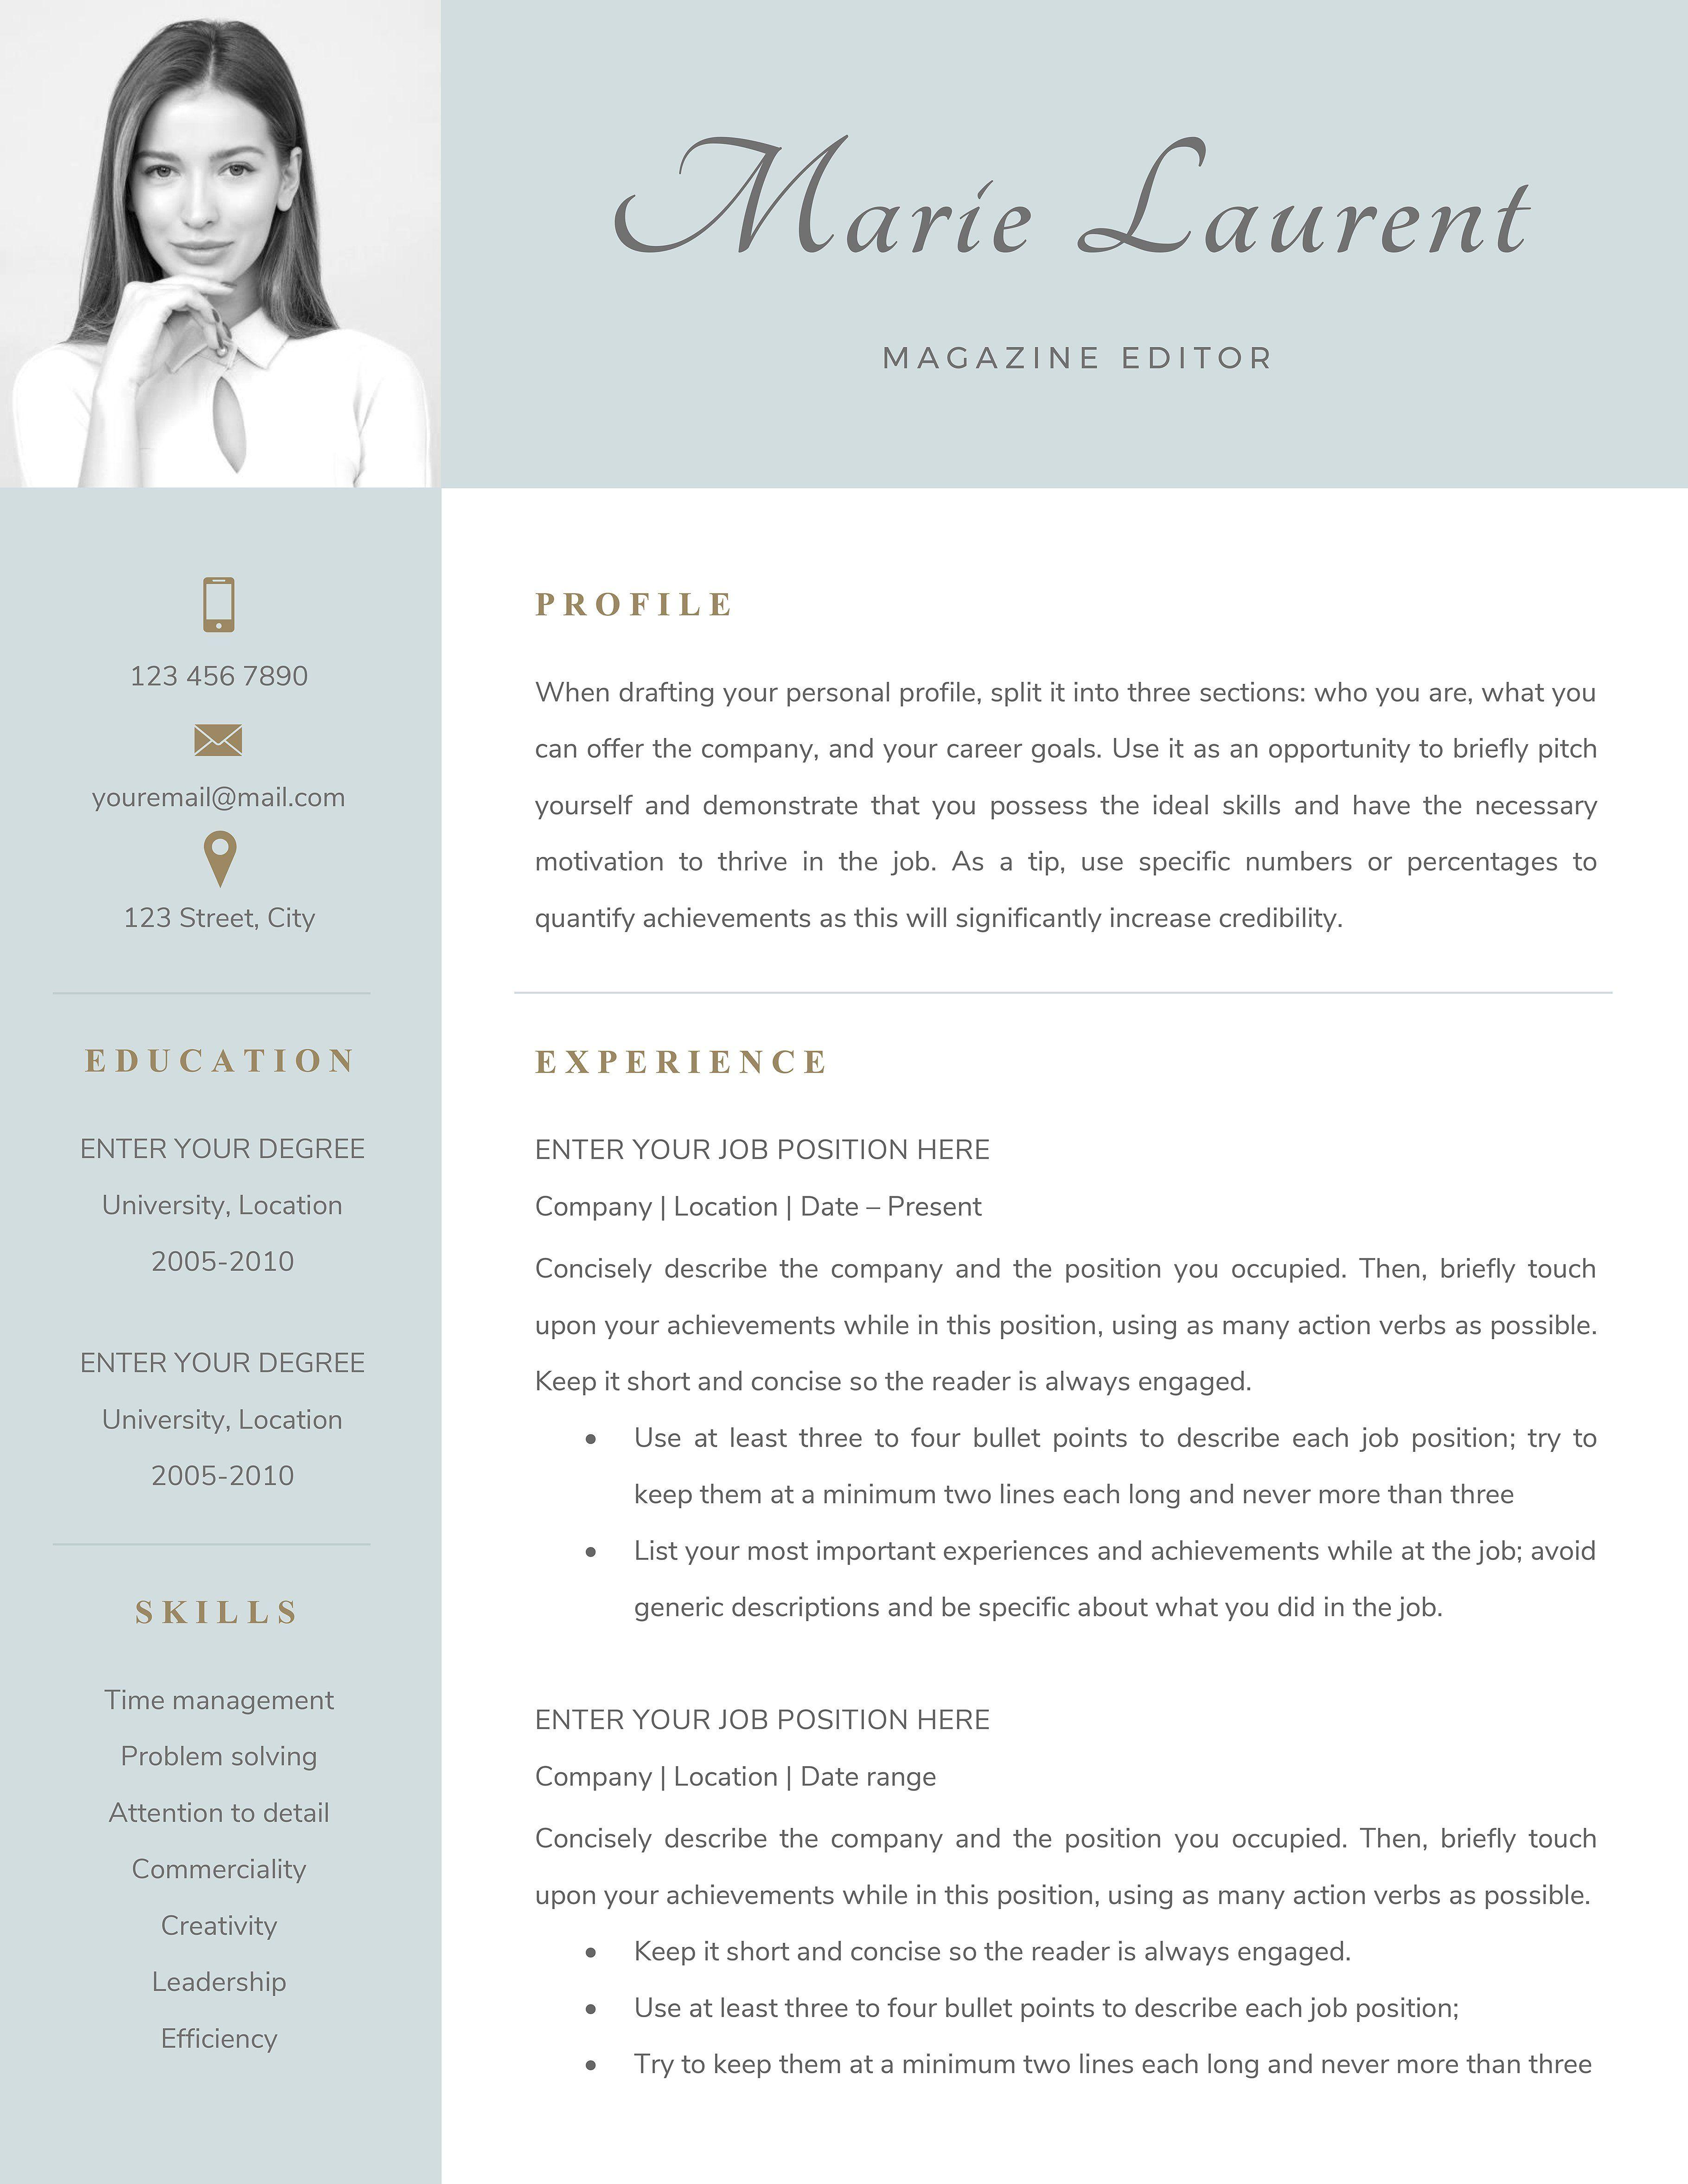 Resume Template textediteasilyfonts Best resume